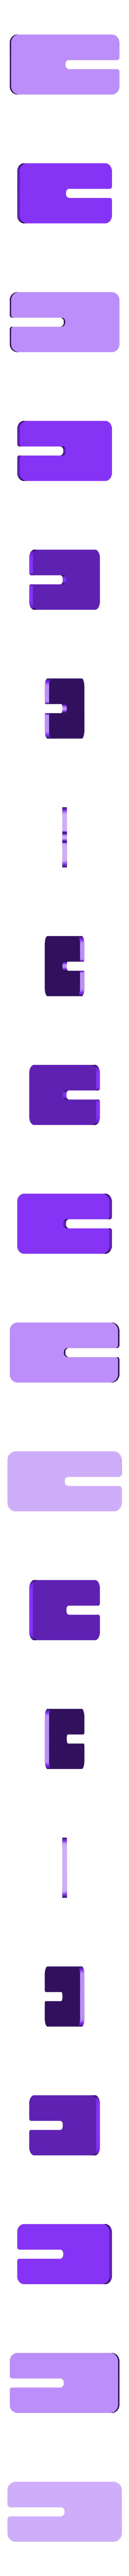 rinforzo_01.STL Download free STL file HUMMER RCPlane parts • 3D print design, daGHIZmo